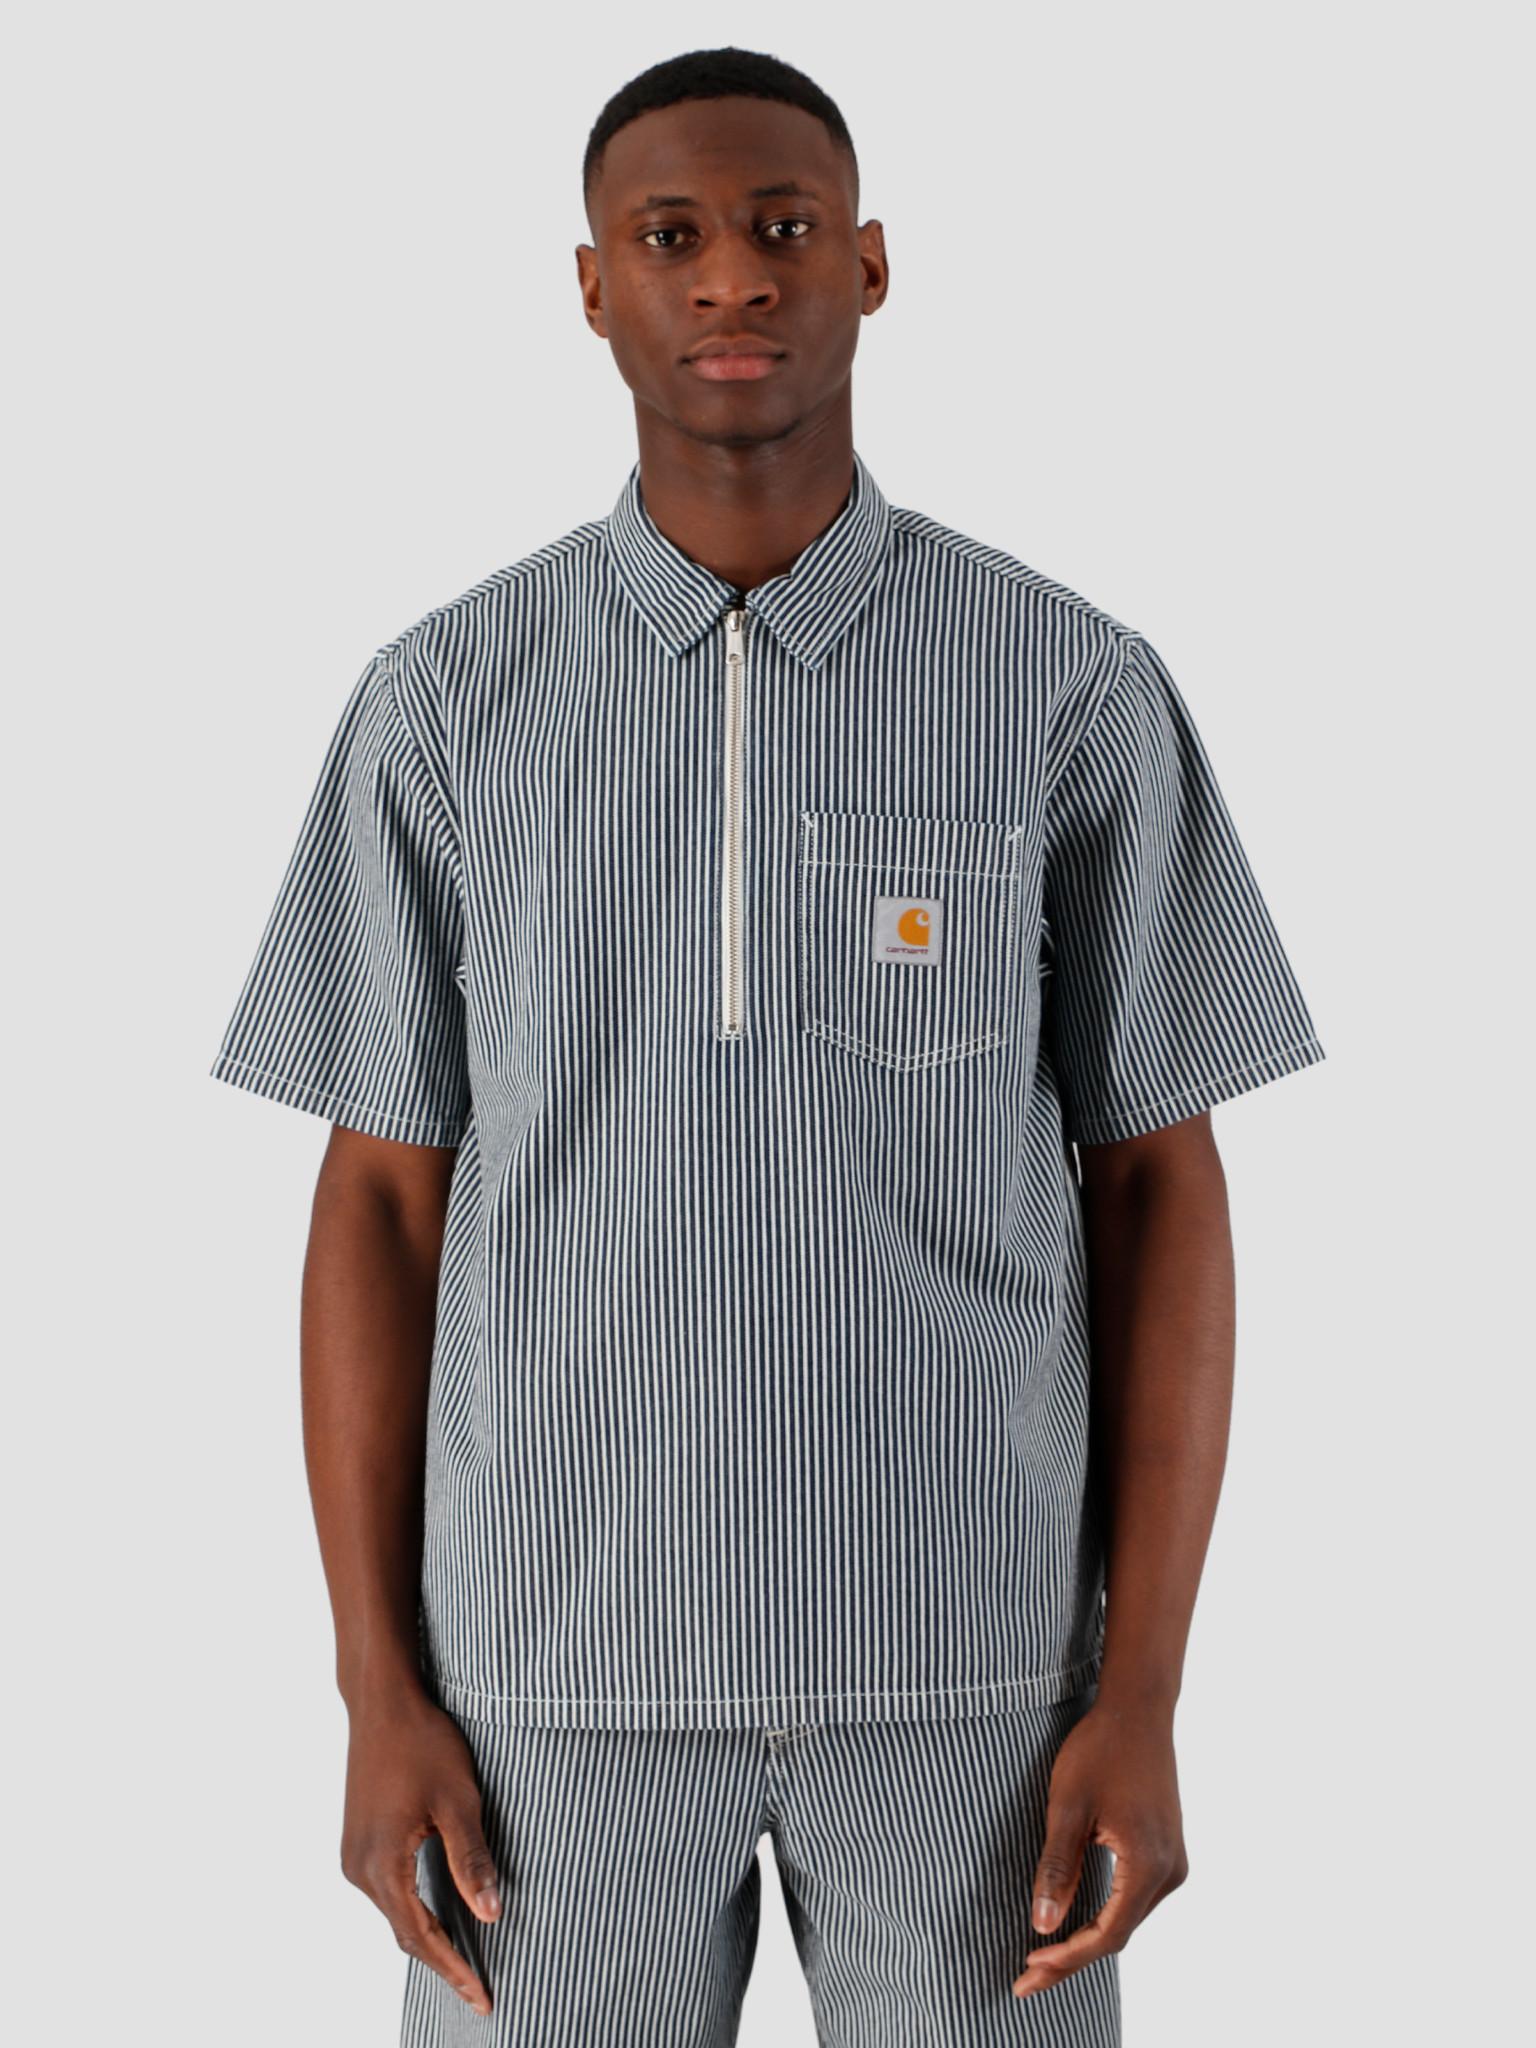 Carhartt WIP Carhartt WIP Dash Short Sleeve Shirt Blue White Rinsed I027987-98102